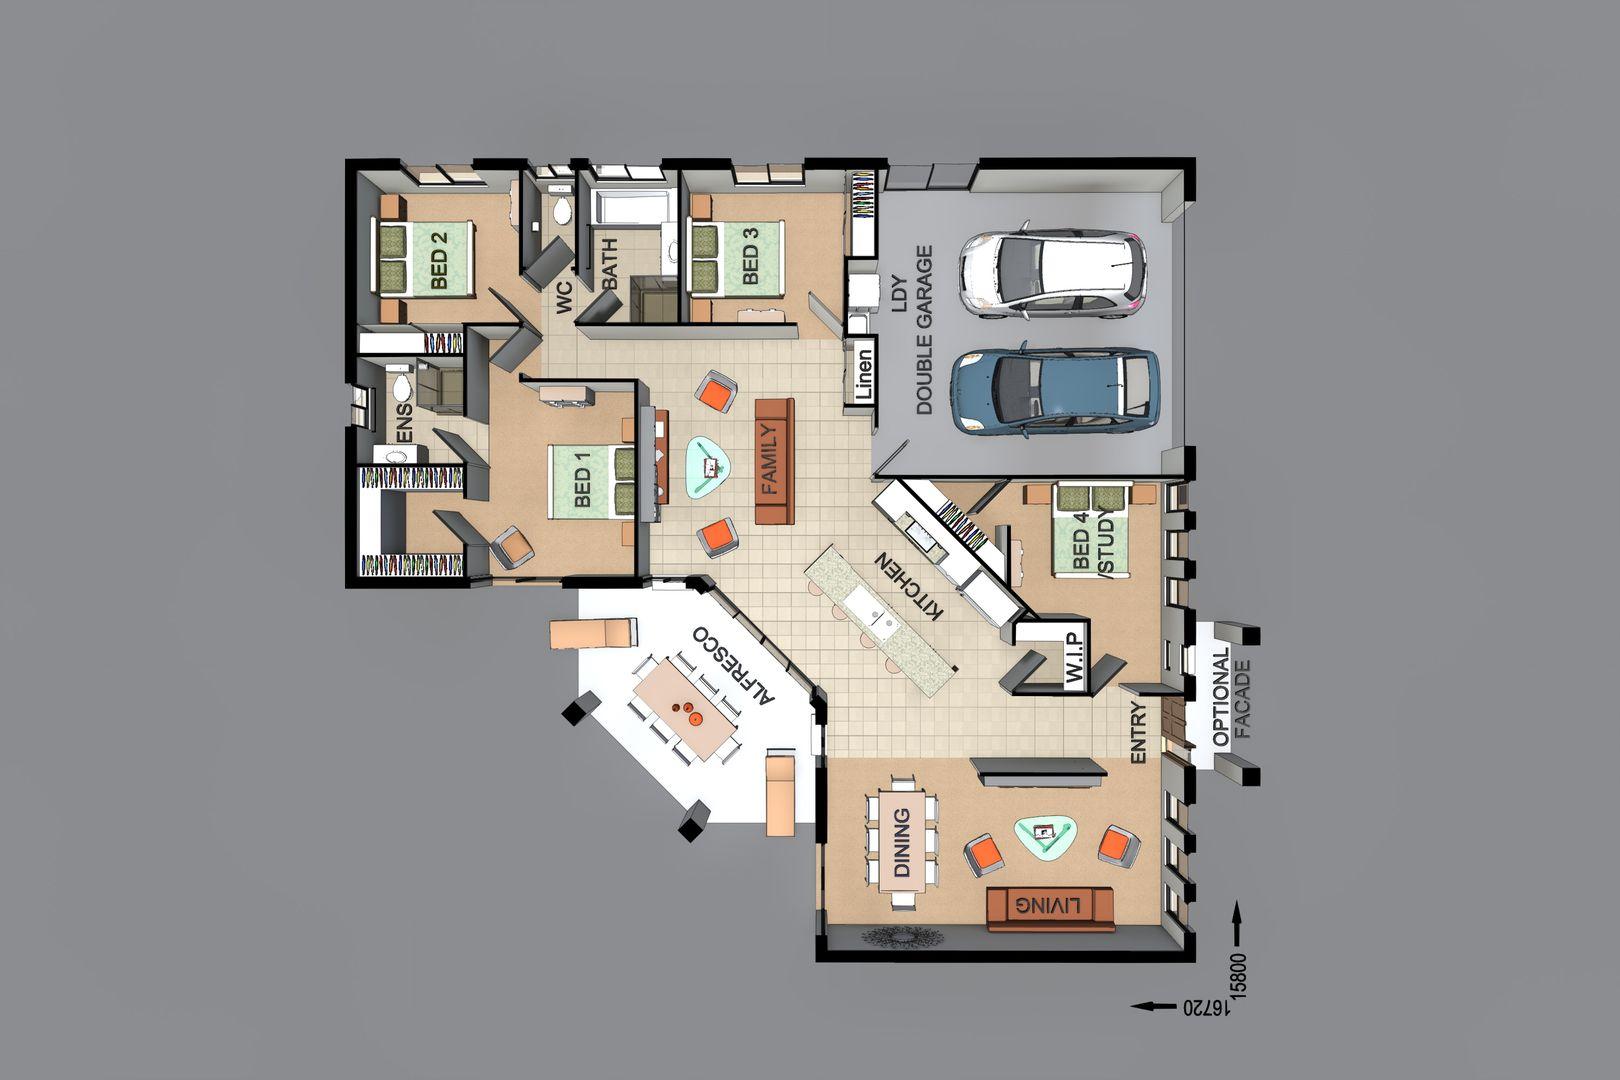 Lot 333 Teddy Street, Beaconsfield QLD 4740, Image 1